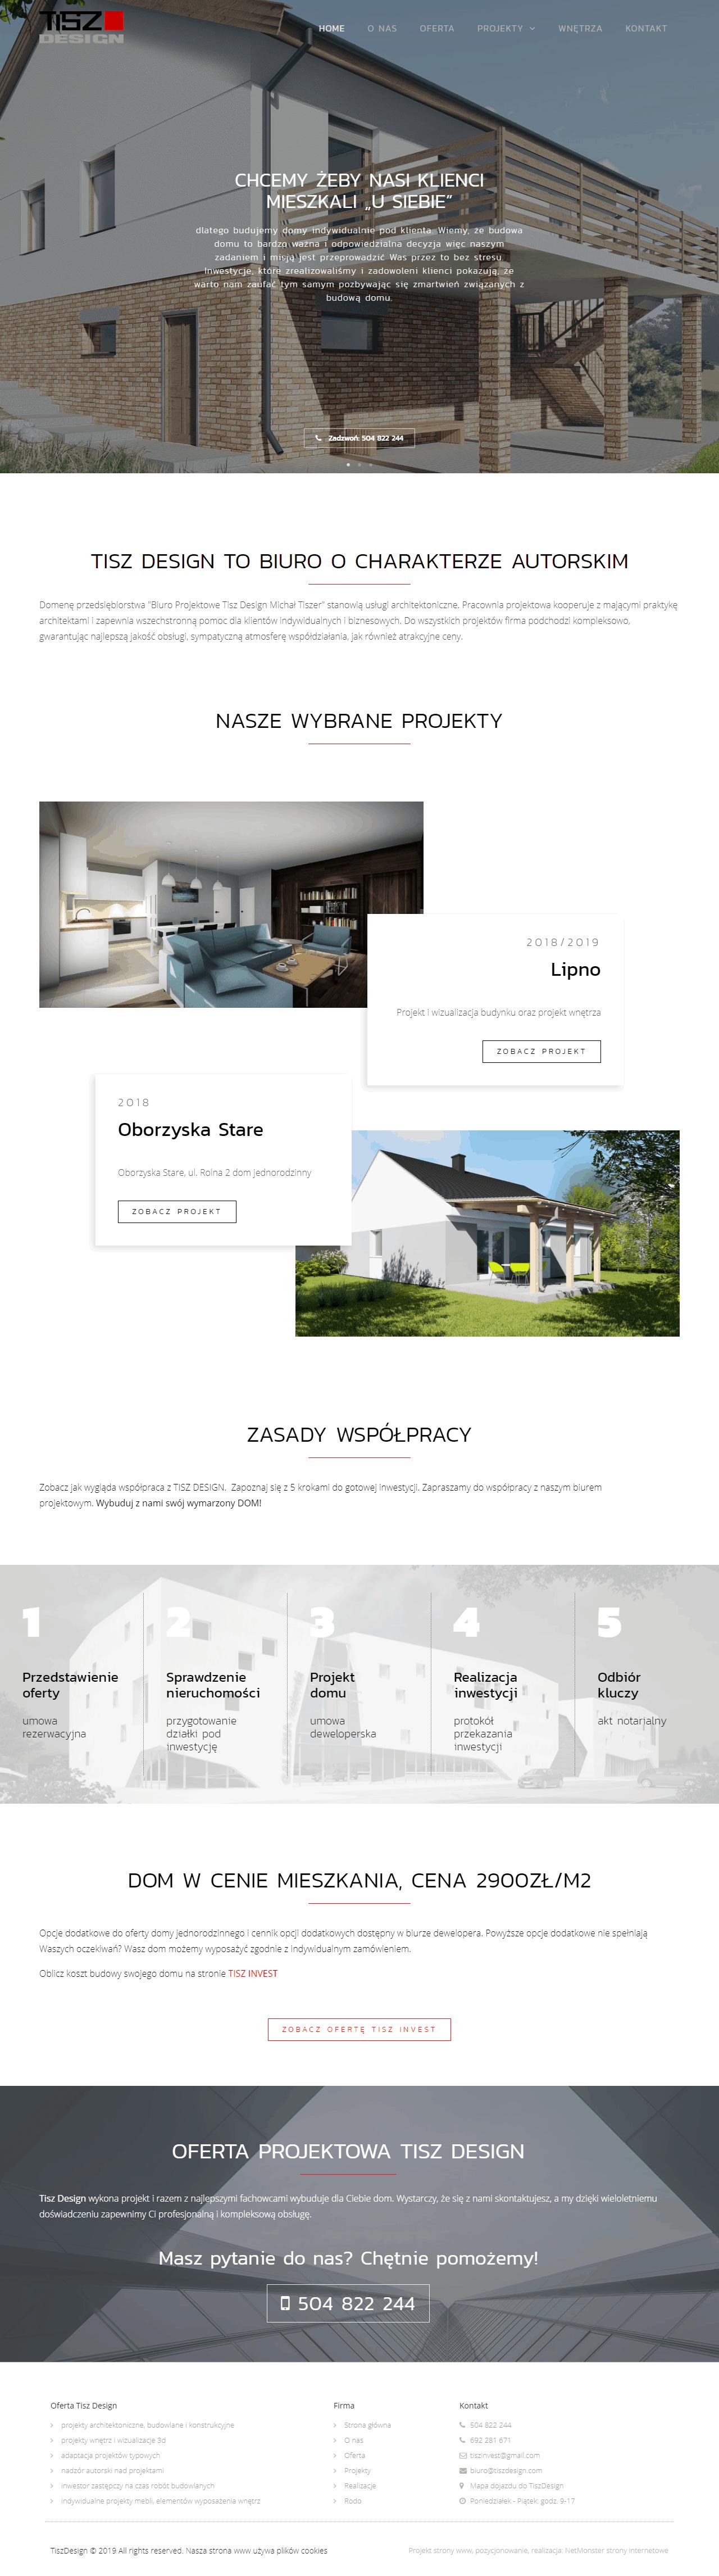 Tworzenie-stron-www-srem-Tisz-design